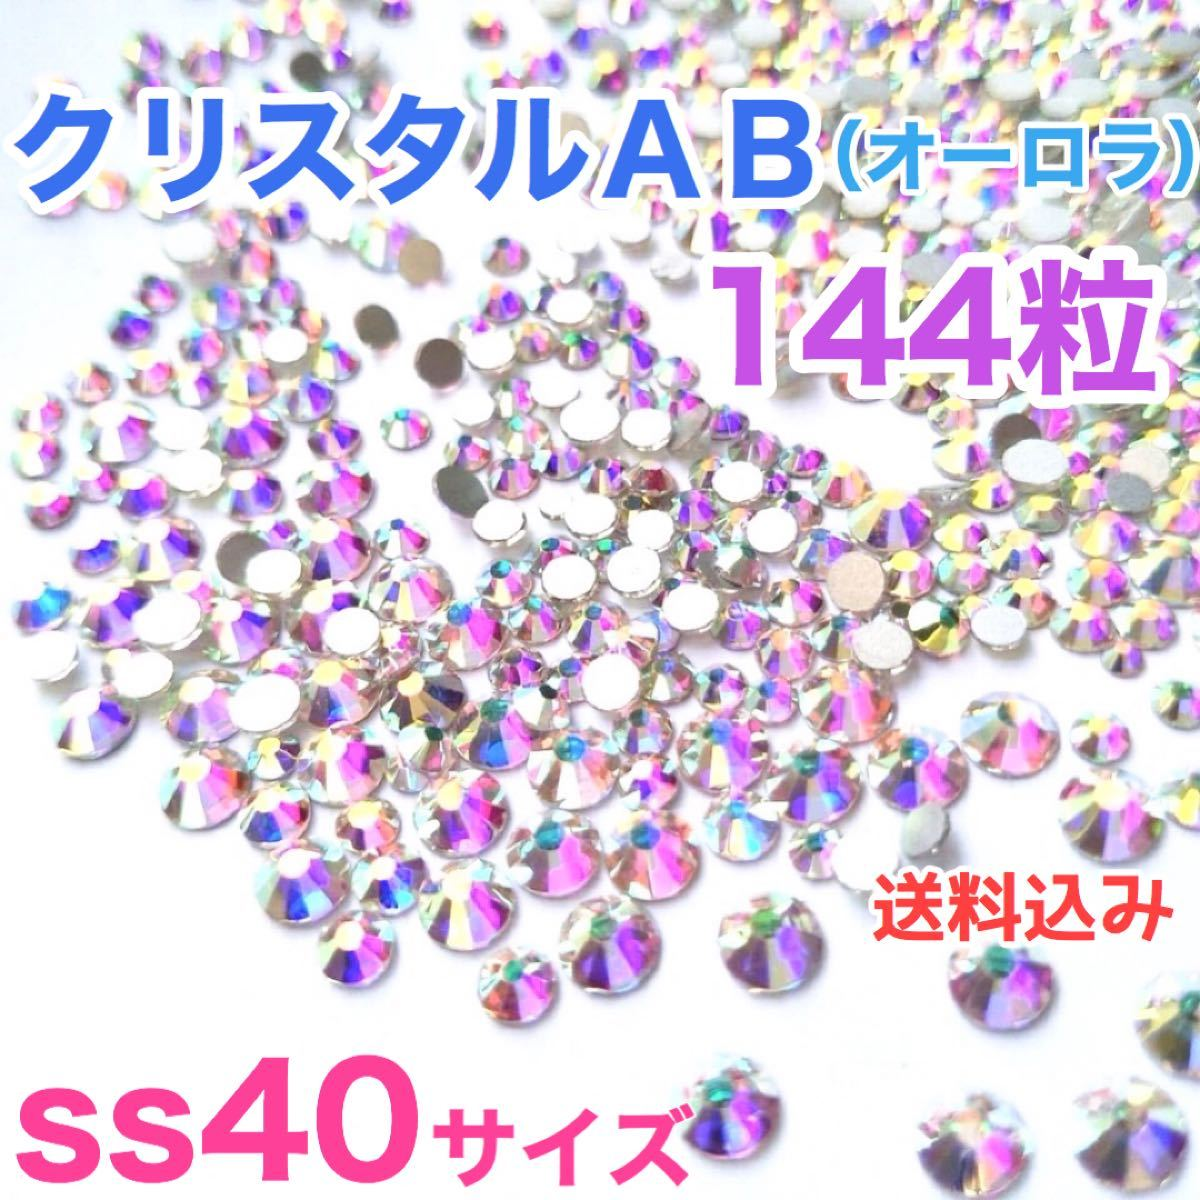 ss40 クリスタルAB オーロラ ガラスストーン 144粒 スワロフスキー代用